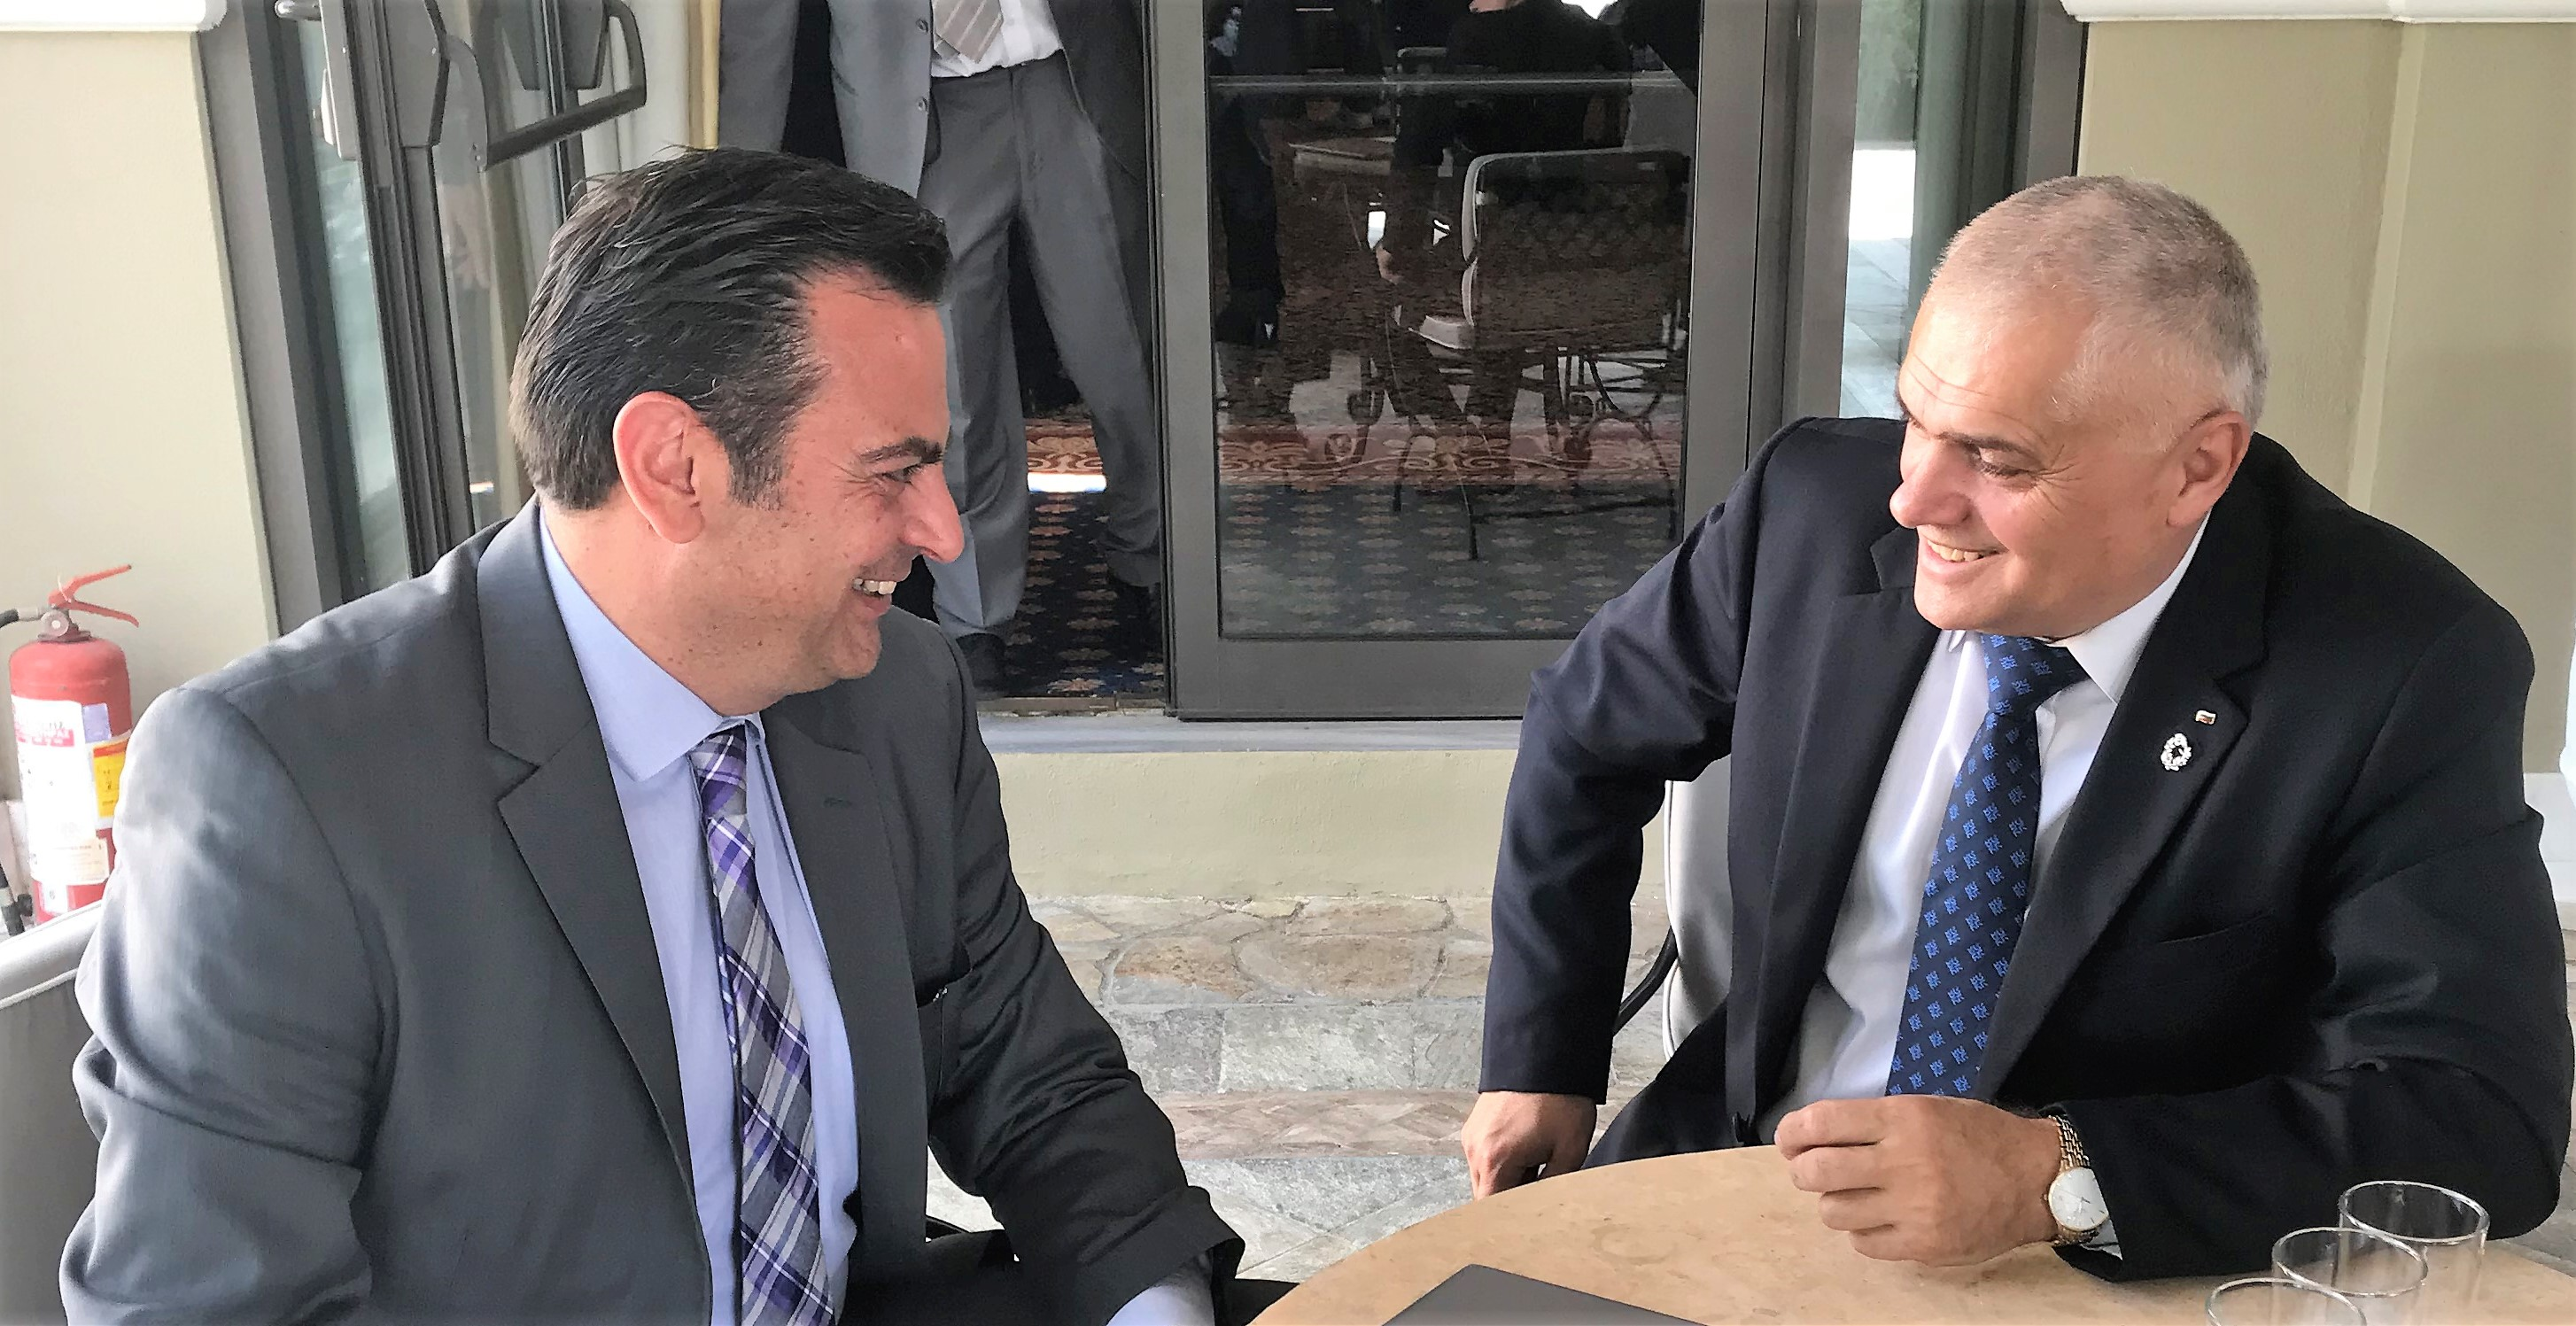 IBNA exclusive interview: Interior Minister Valentin Radev